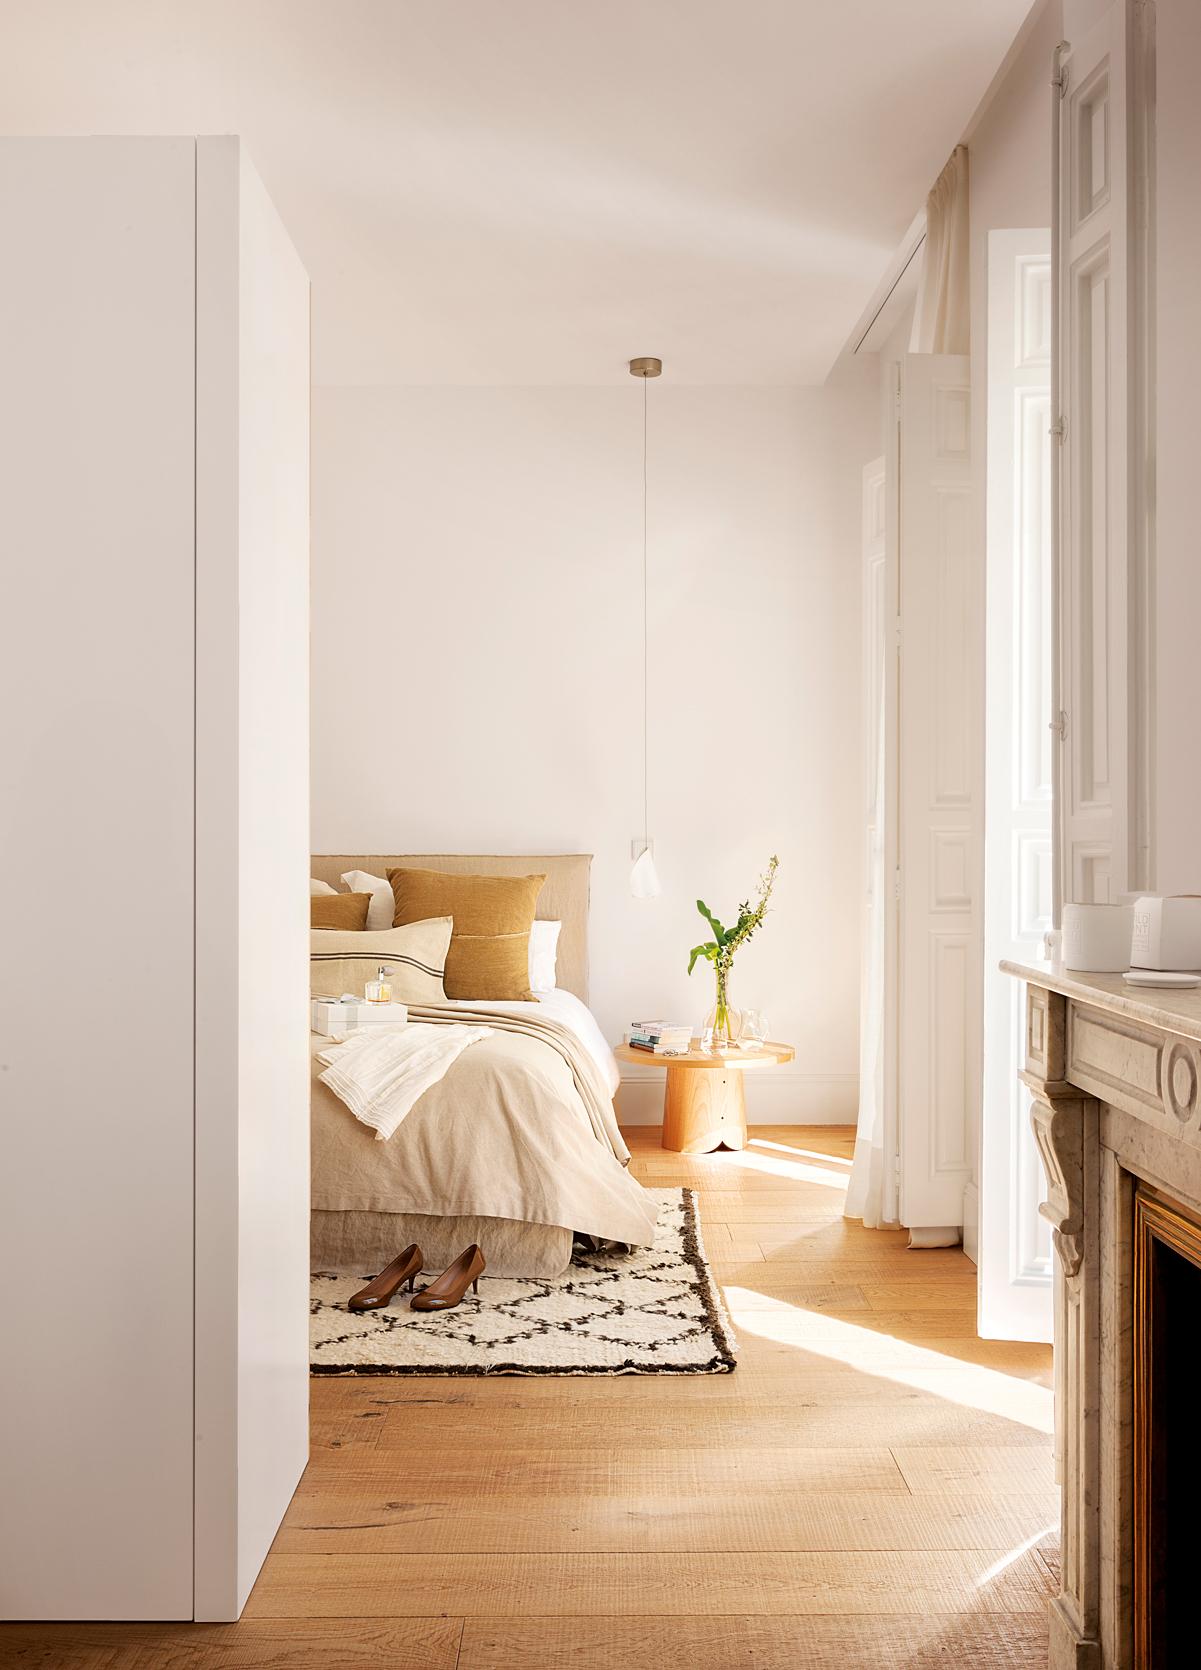 Feng shui para decorar tu dormitorio - Como decorar tu cuarto ...